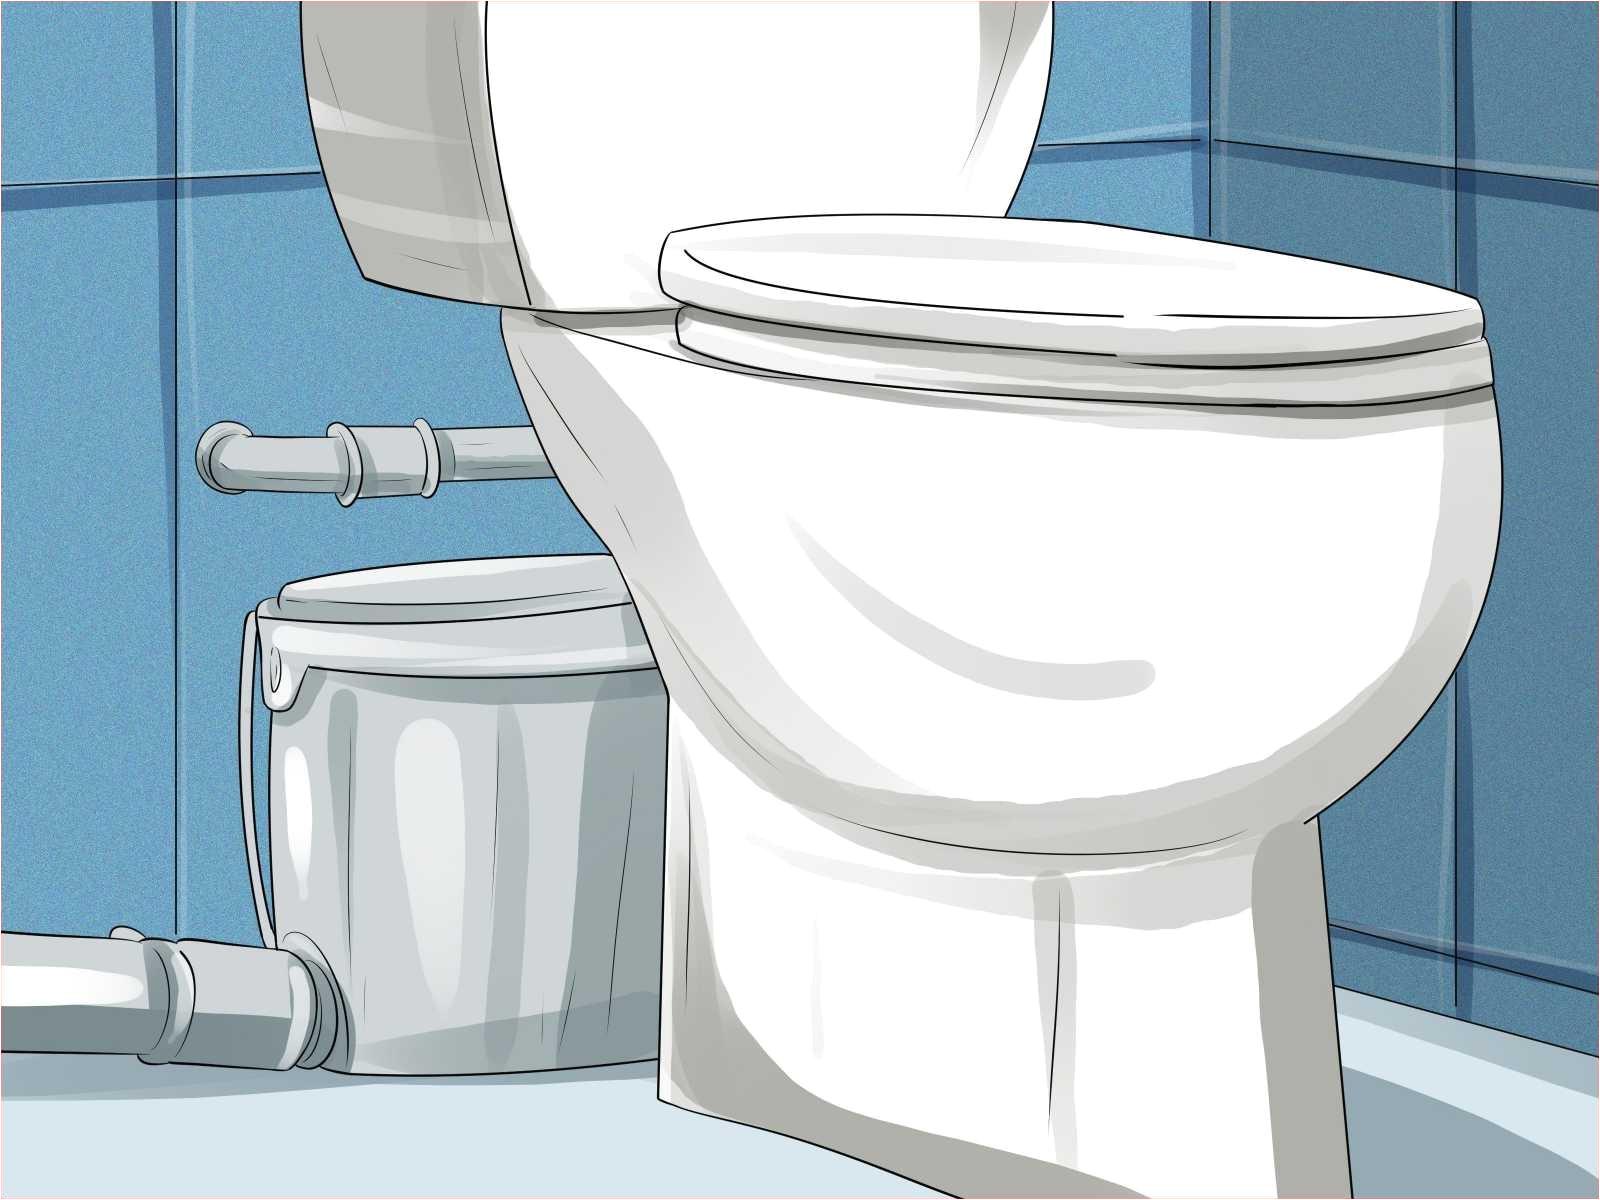 refinishing bathtub awesome bathtub reglazing nj inspirational shower drain plumbing elegant 0d